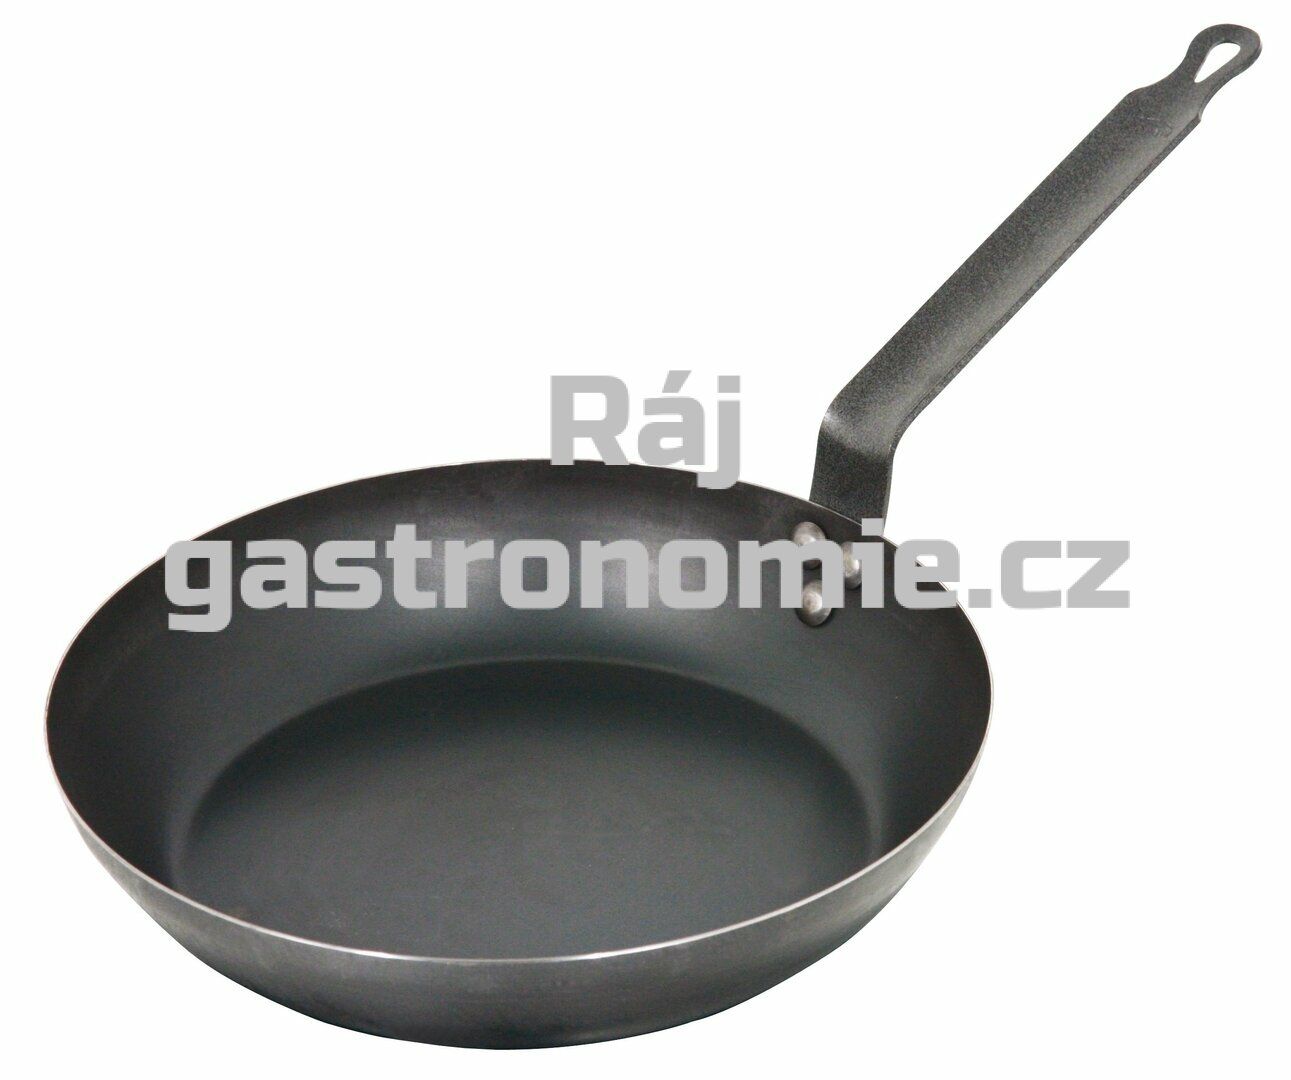 Pánev černá ocel Ø 24 cm